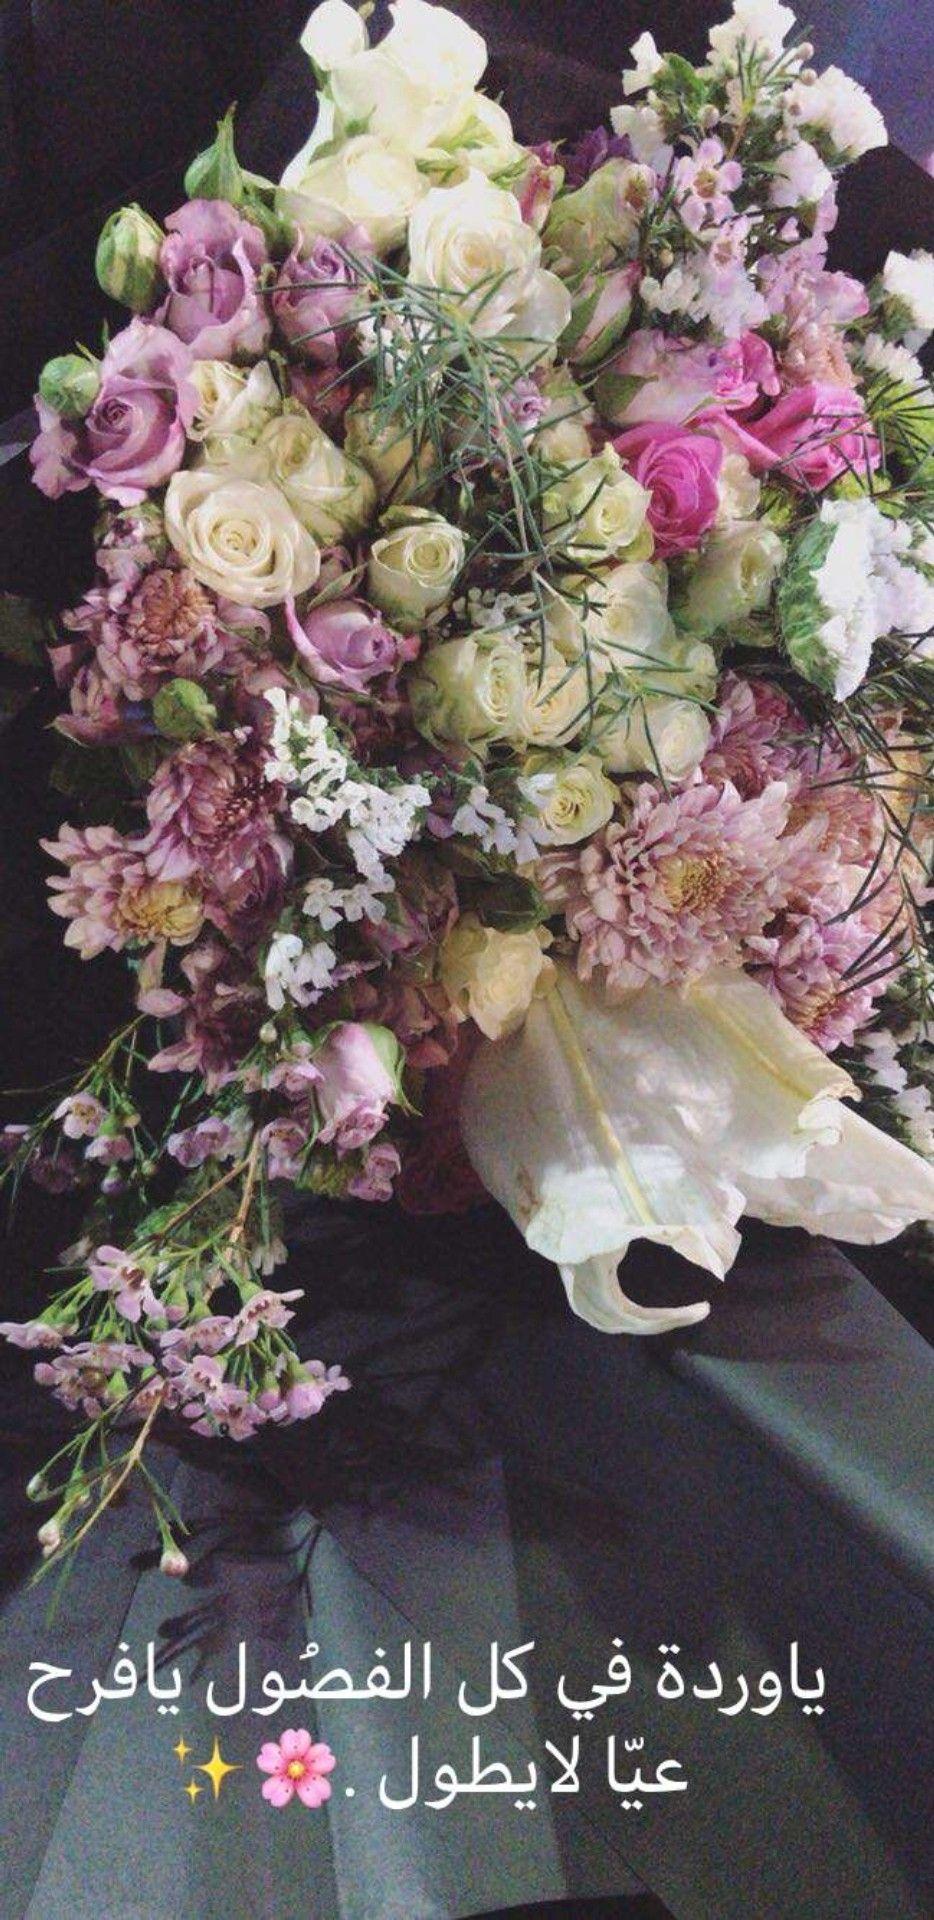 Pin By Ghada Alotaibi On Islam Floral Wreath Floral Decor